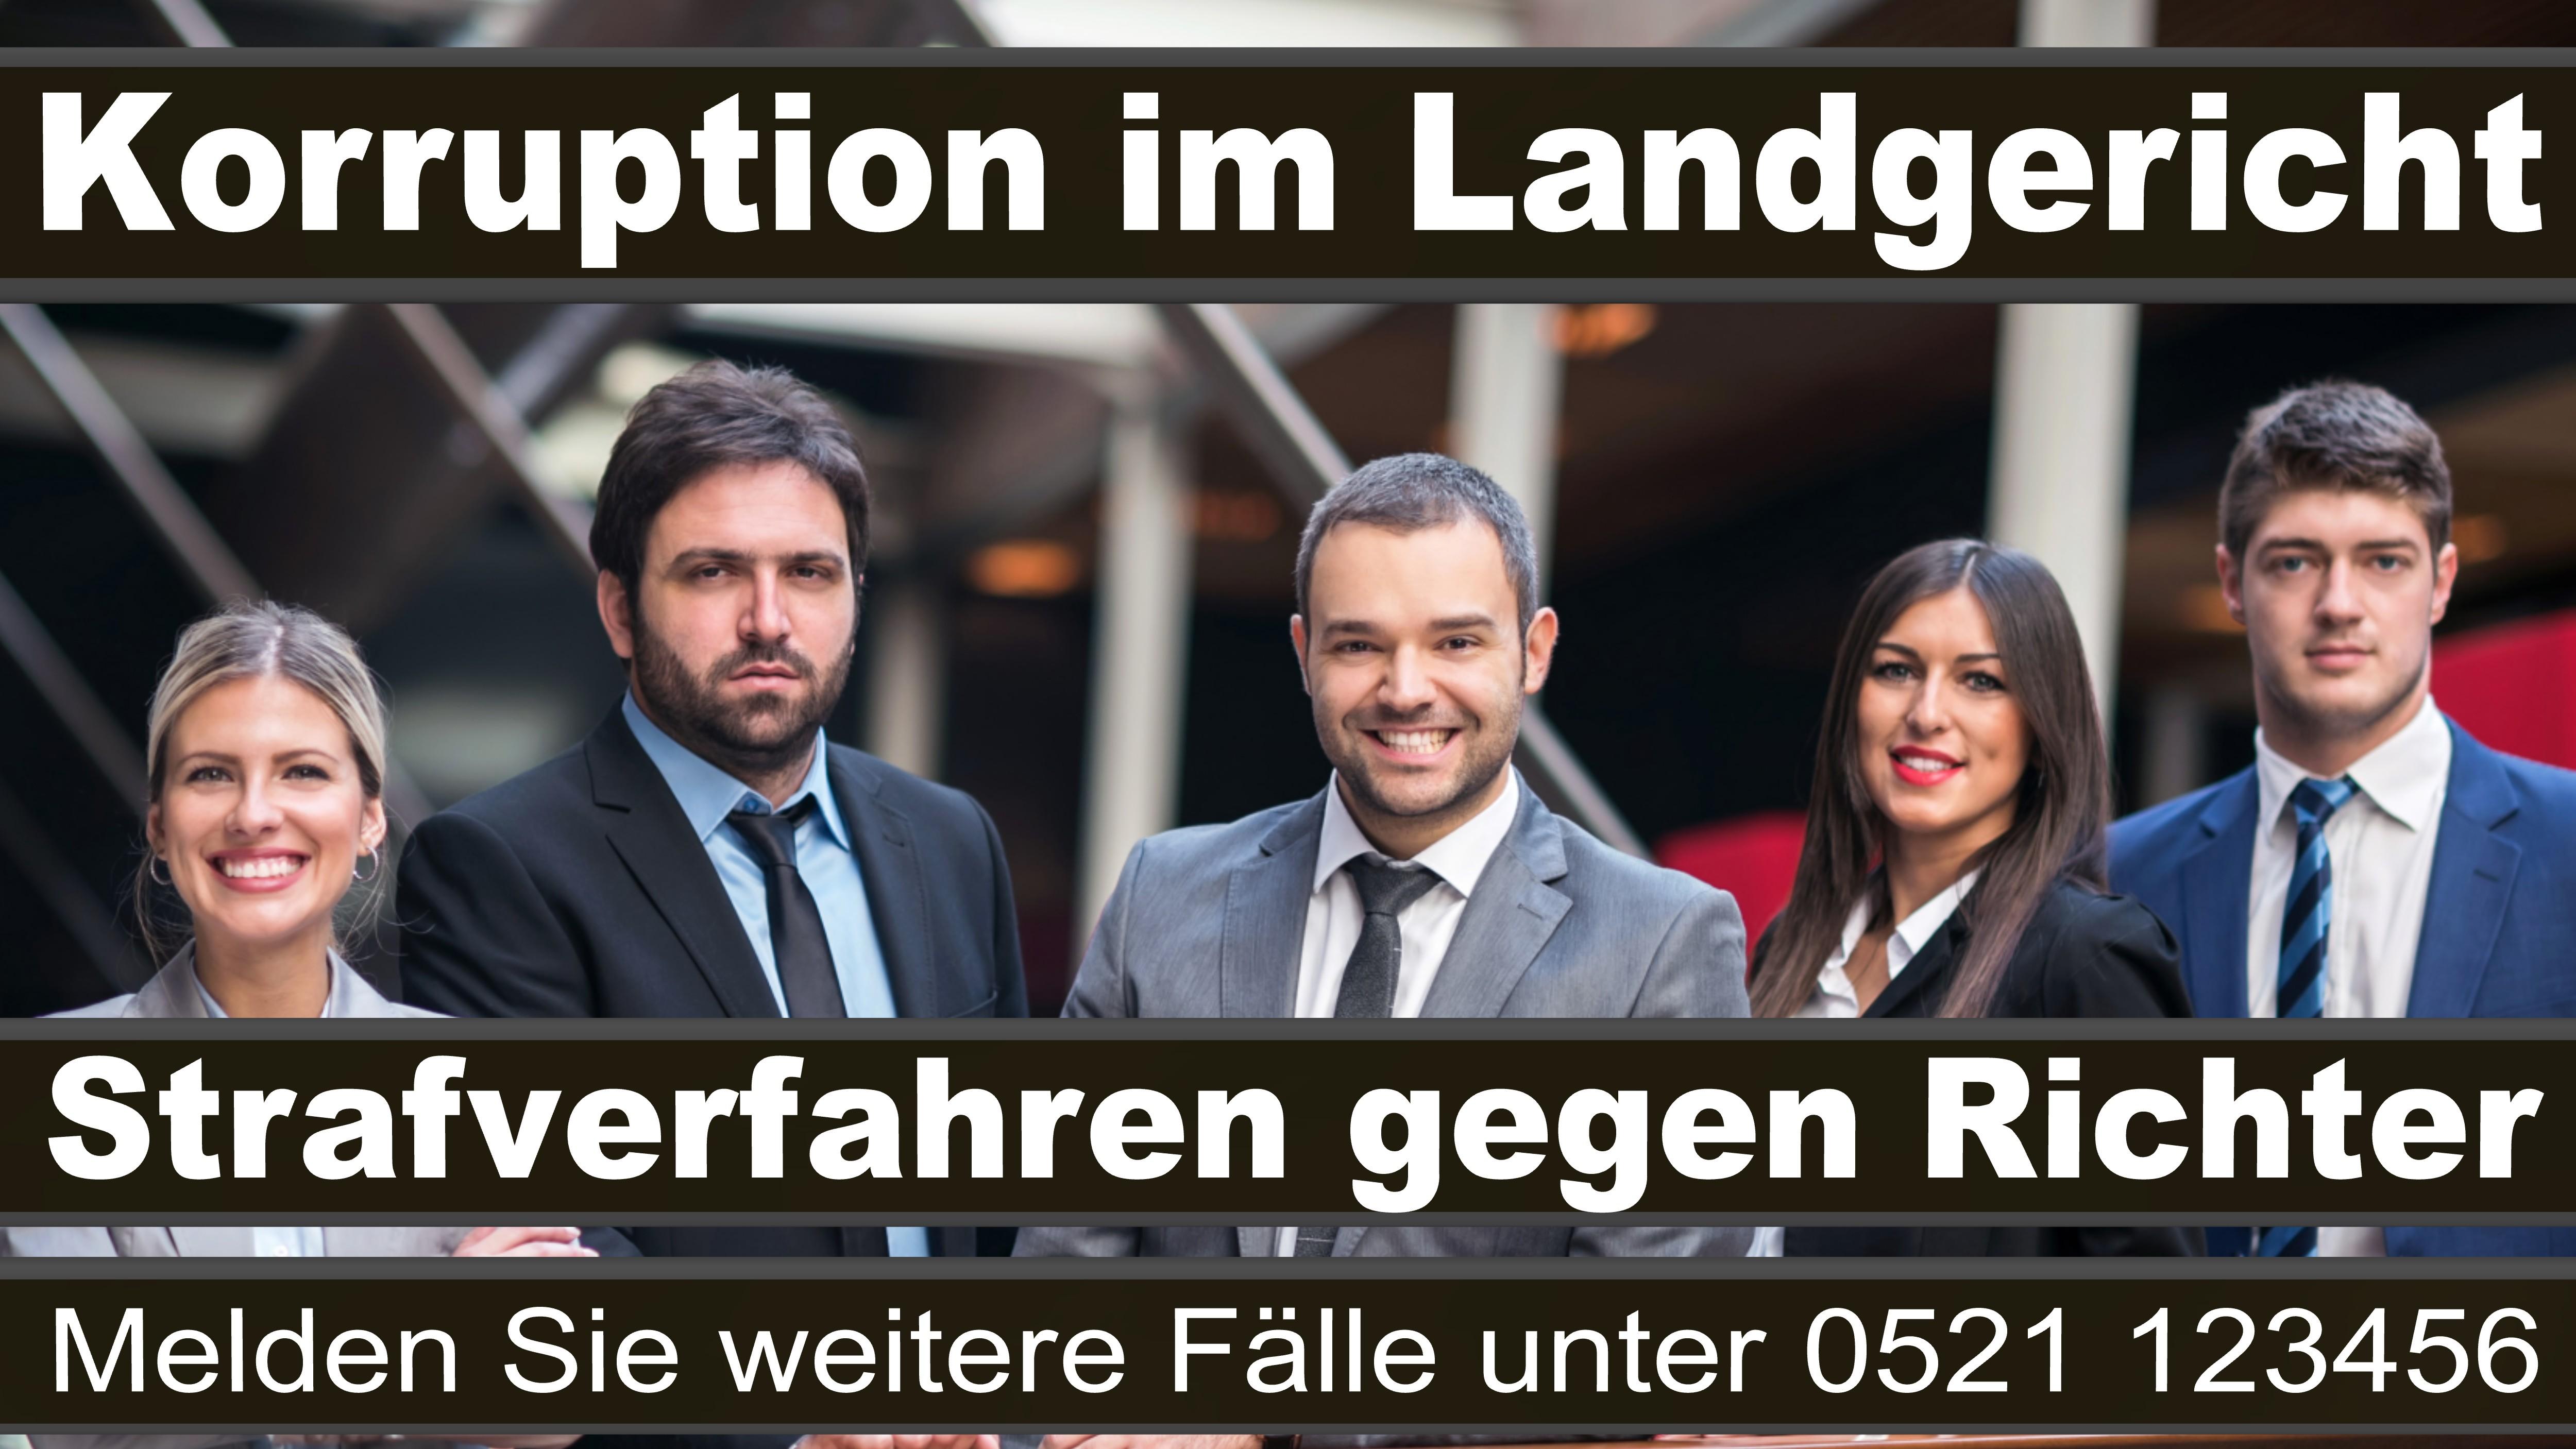 Staatsgerichtshof Des Landes Hessen